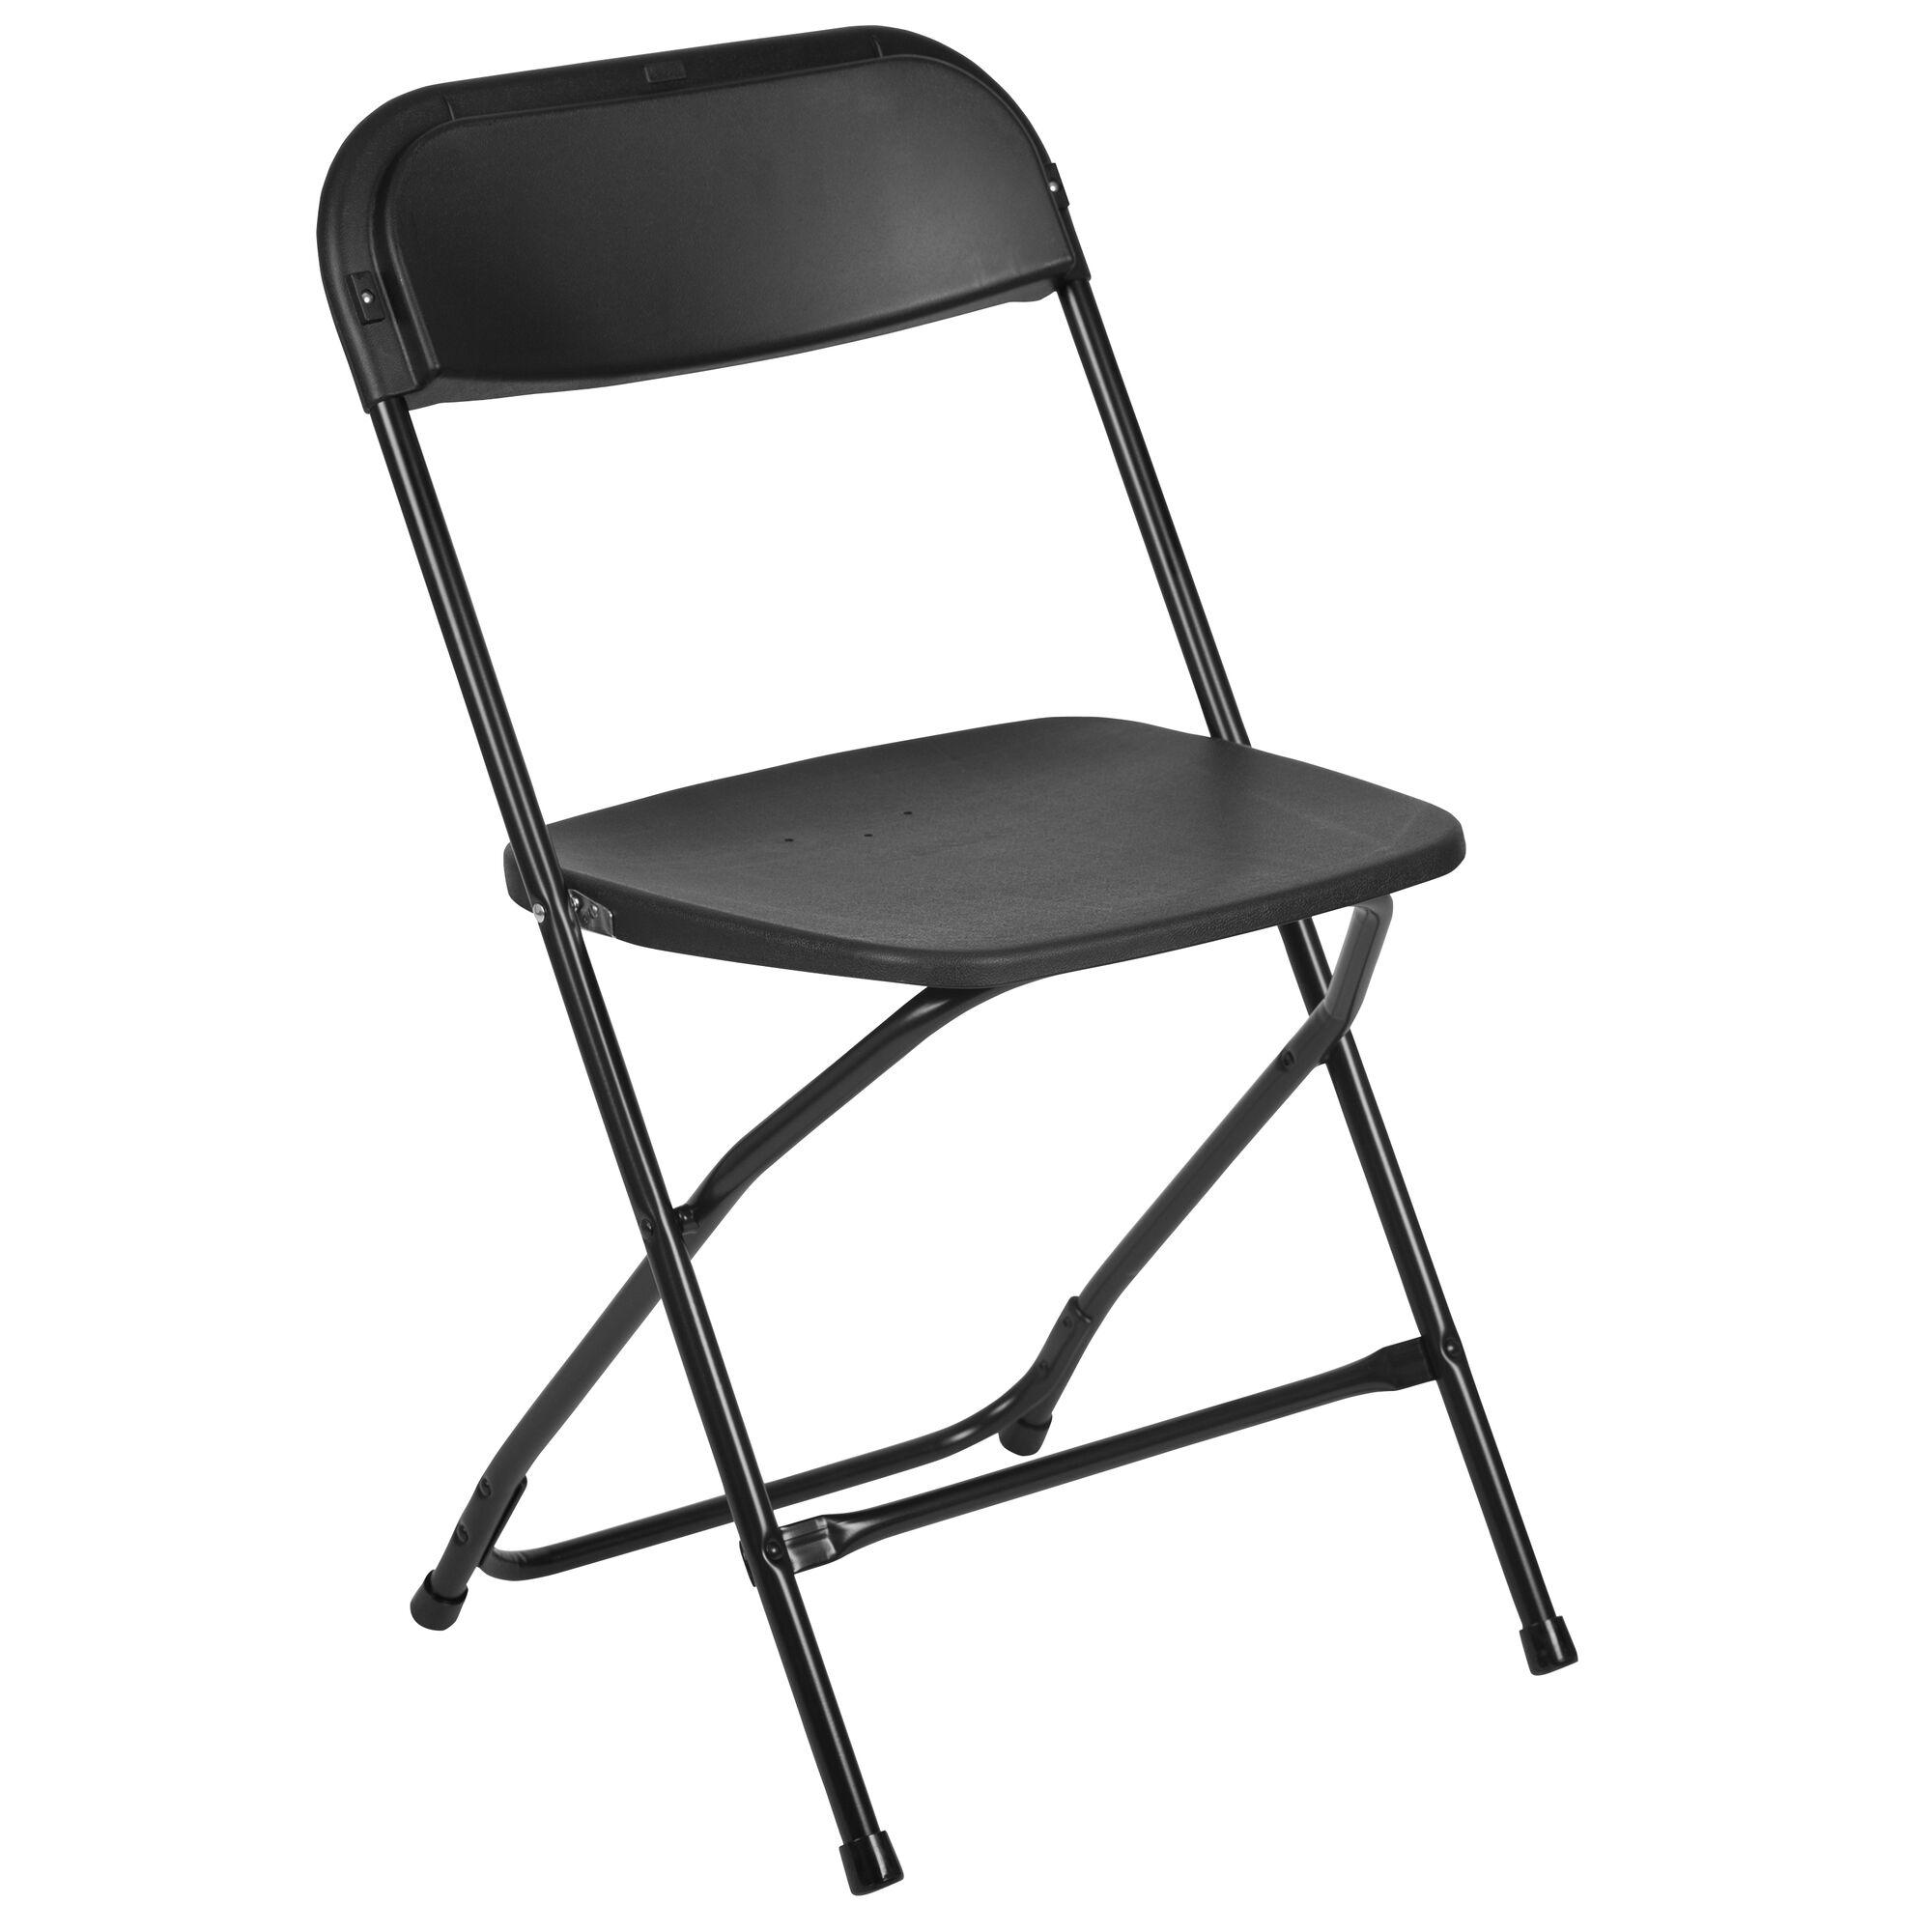 Terrific Hercules Series 650 Lb Capacity Premium Plastic Folding Chair Alphanode Cool Chair Designs And Ideas Alphanodeonline